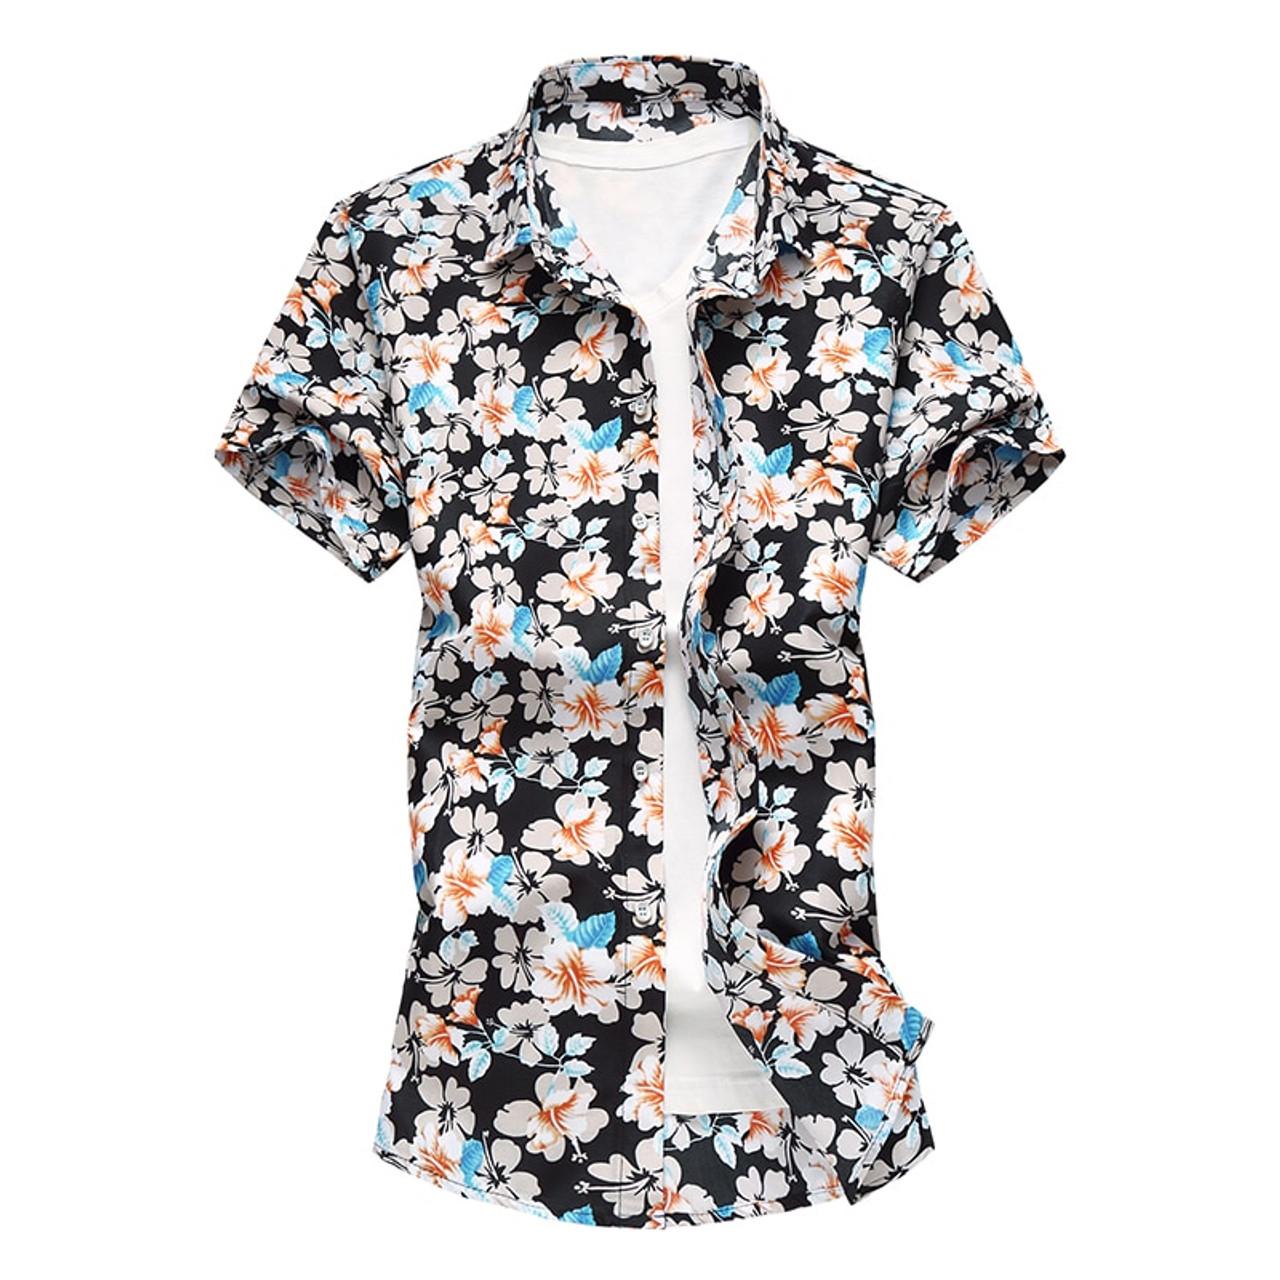 6676ede0dcd ... Summer Mens Short Sleeve Beach Hawaiian Shirts Cotton Casual Floral  Shirts Plus Size 7XL 2018 New ...